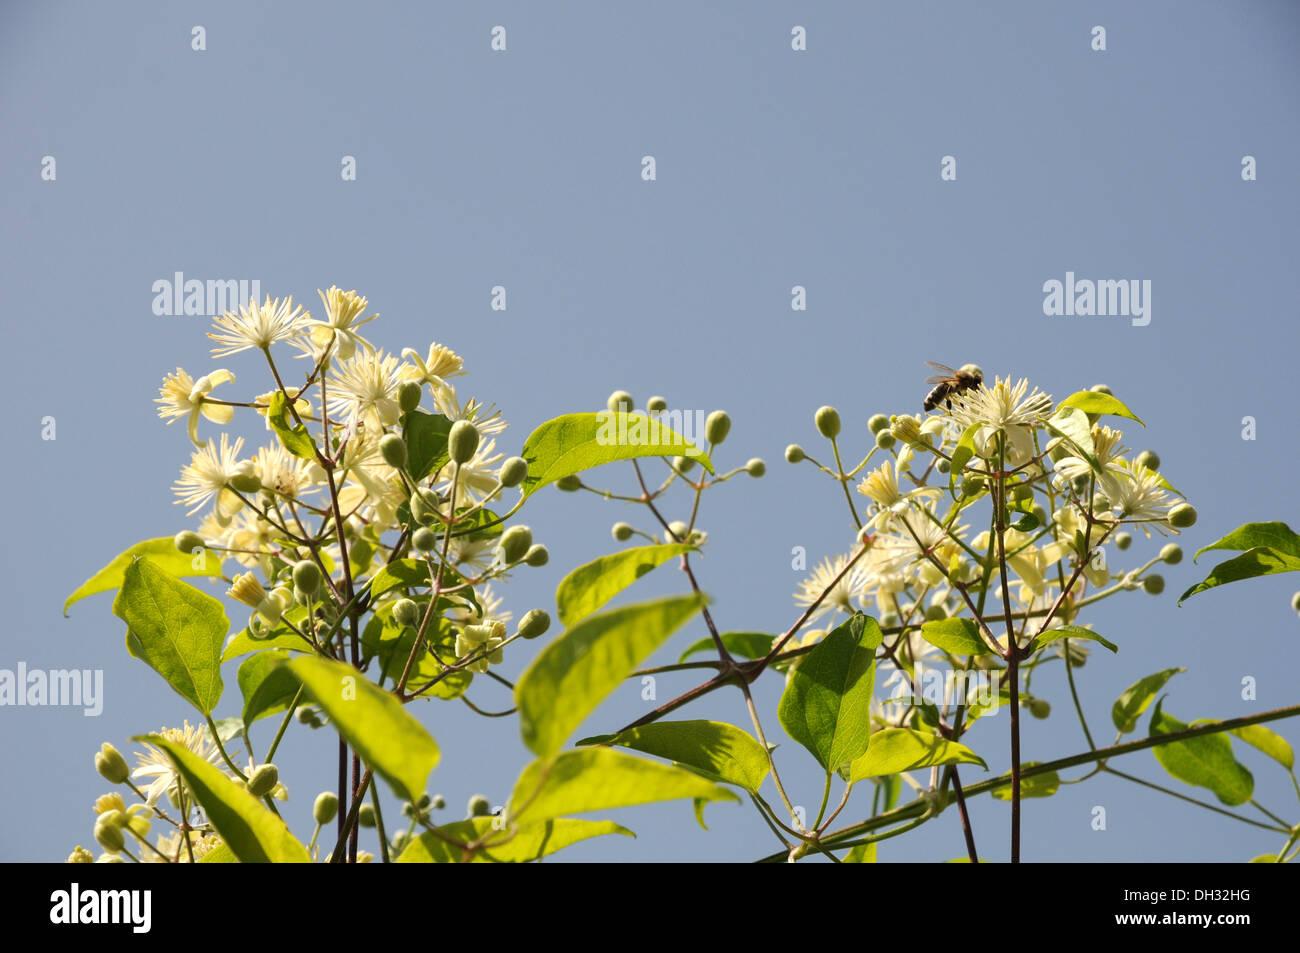 Clematis vitalba - Stock Image